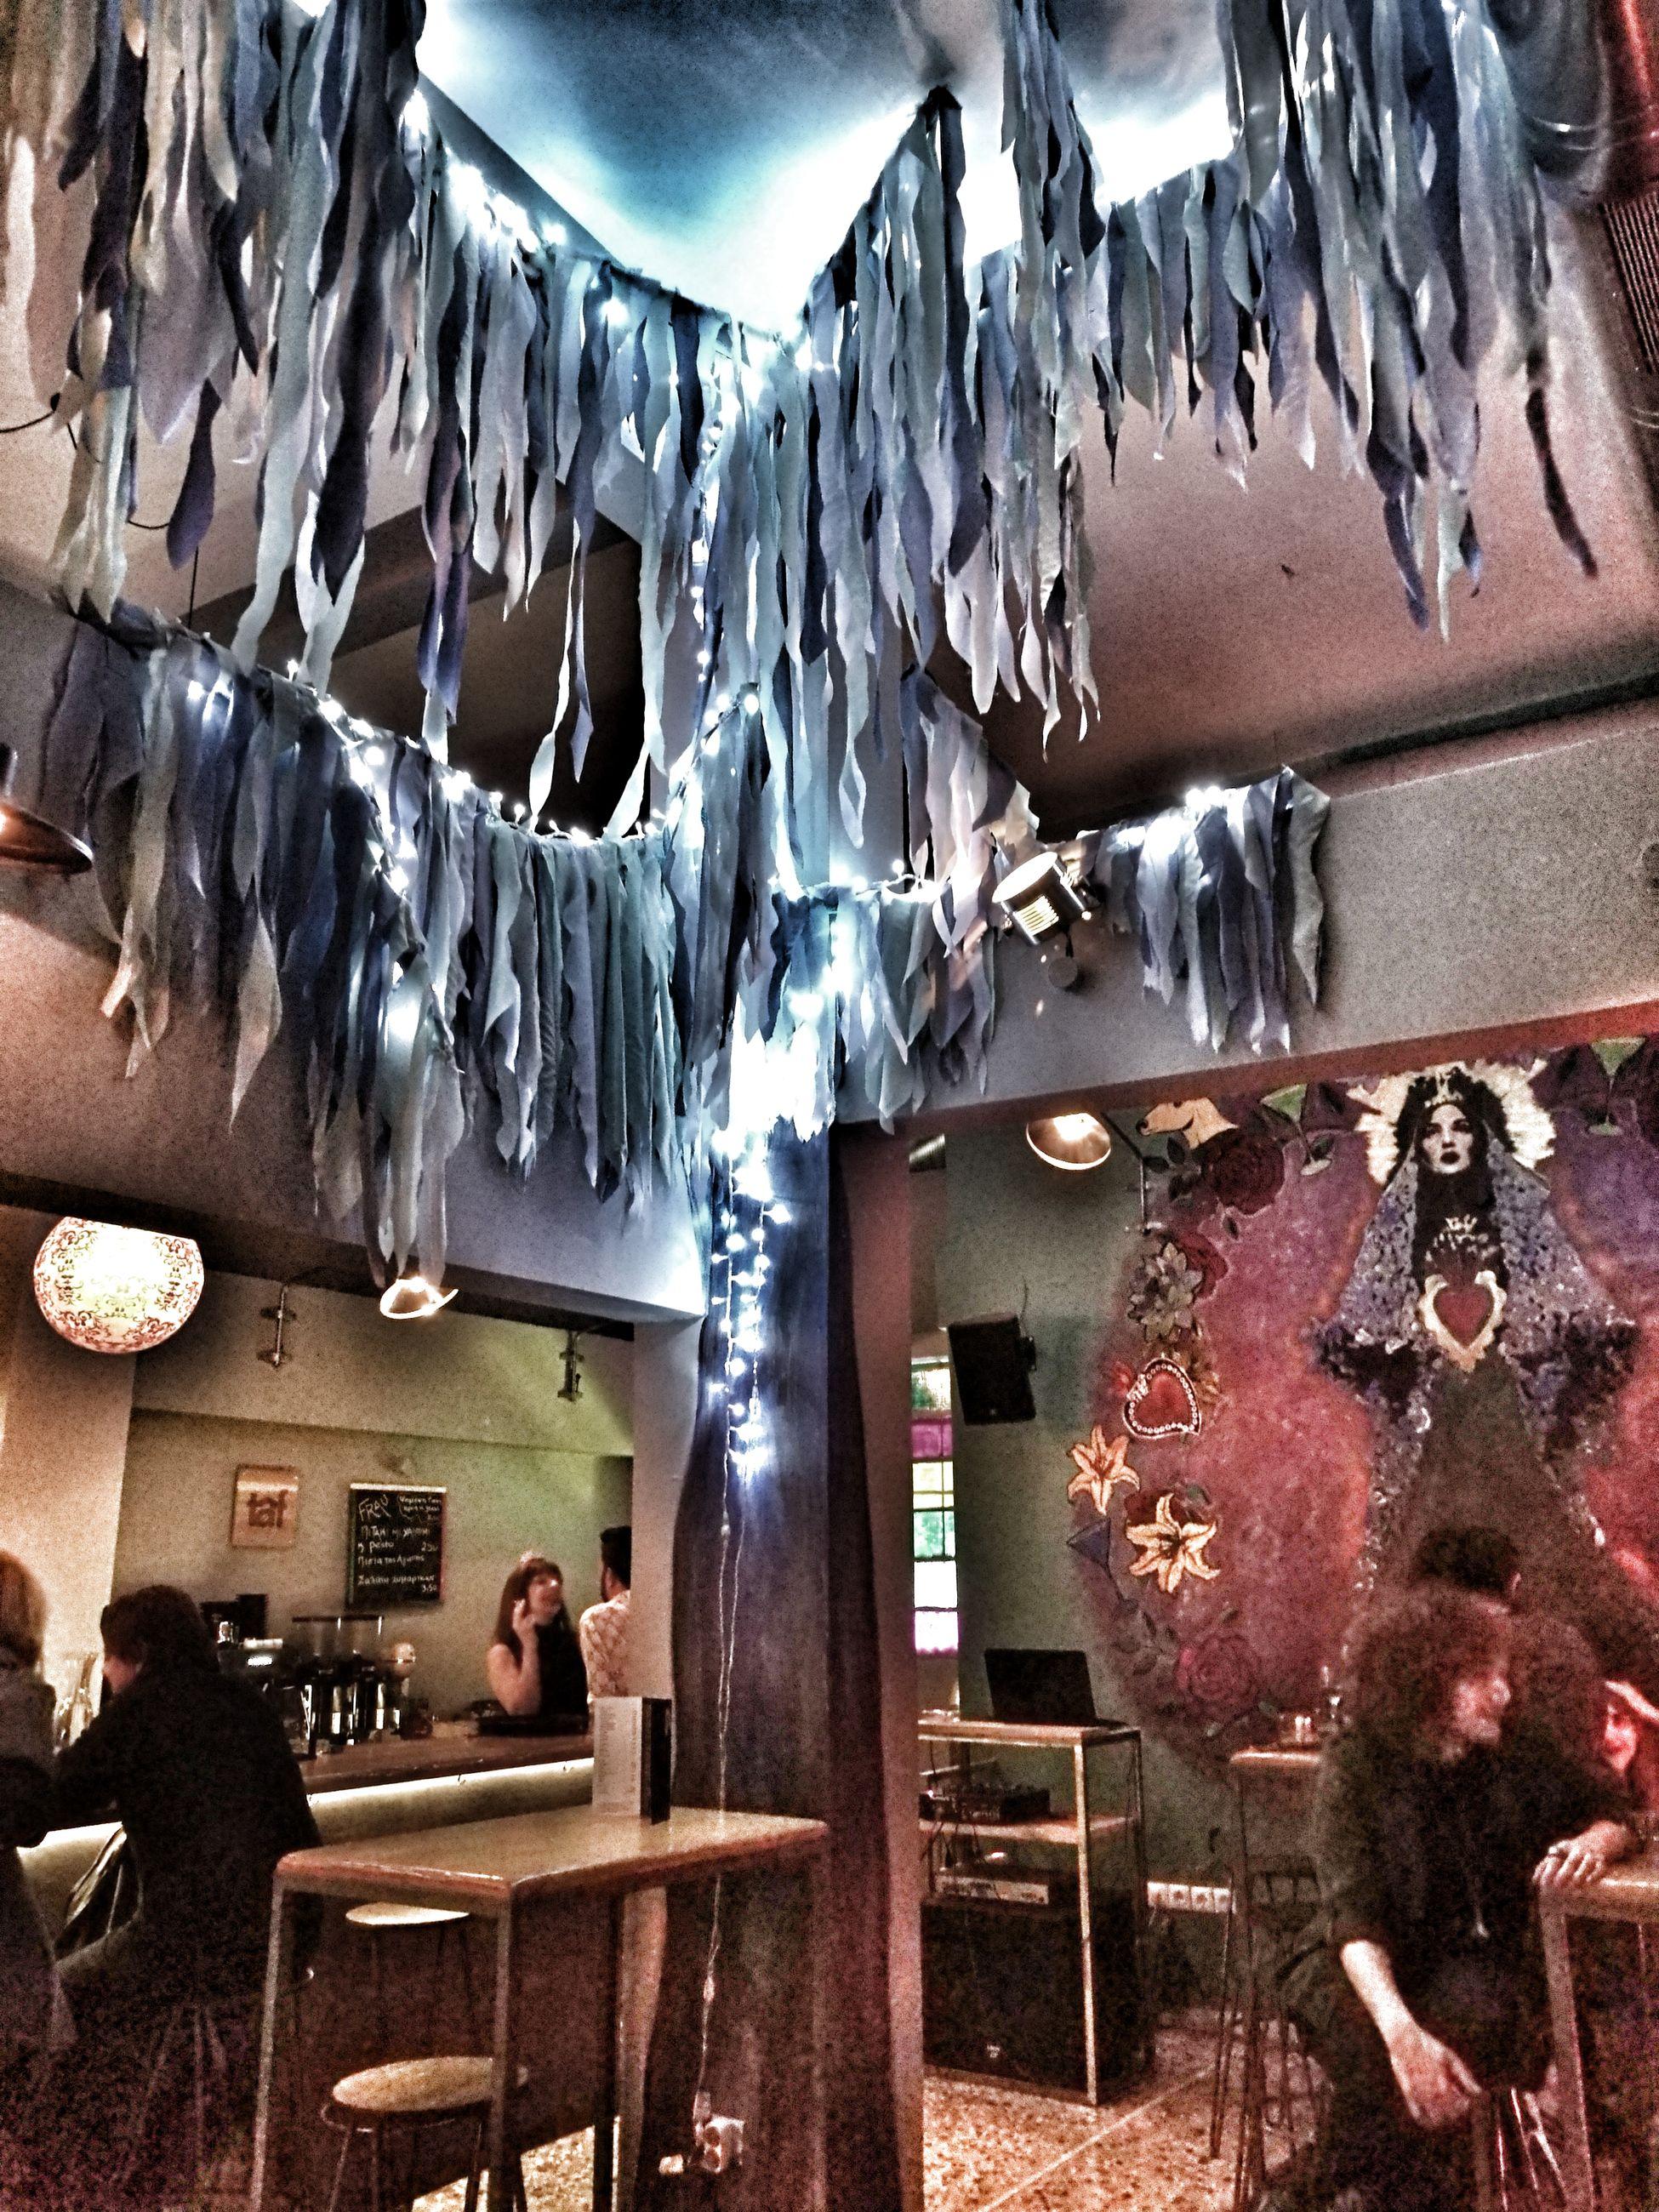 Cold Temperature Nightmarebeforechristmas Frau Fraubar Bar Night Athens